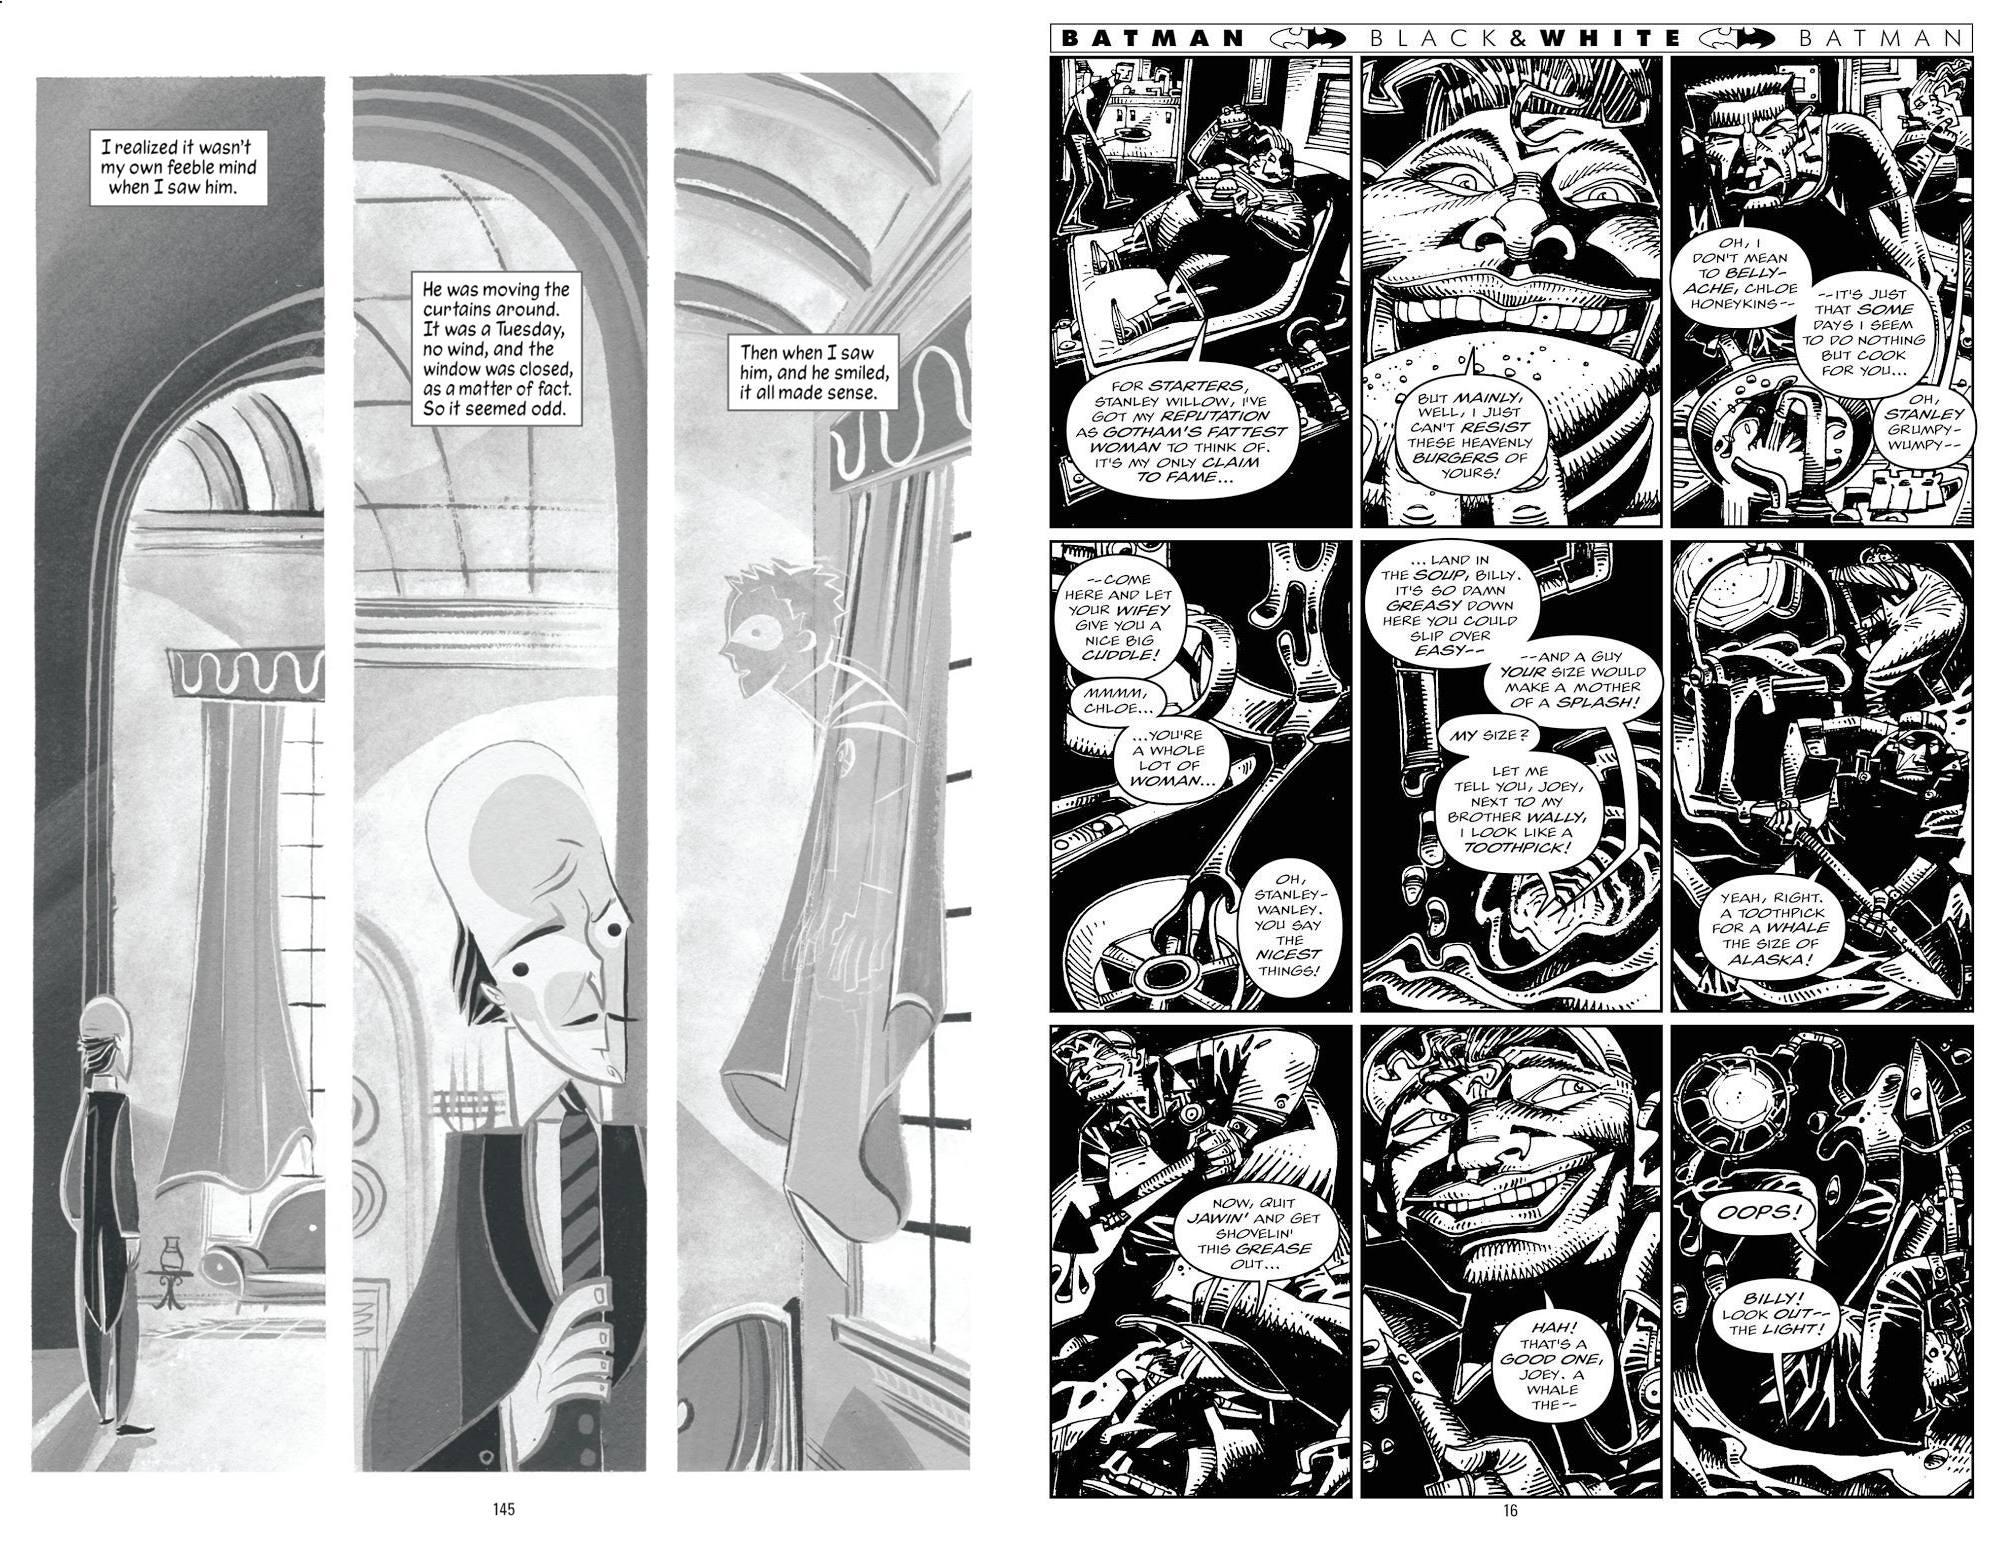 Batman Black and White vol 3 review